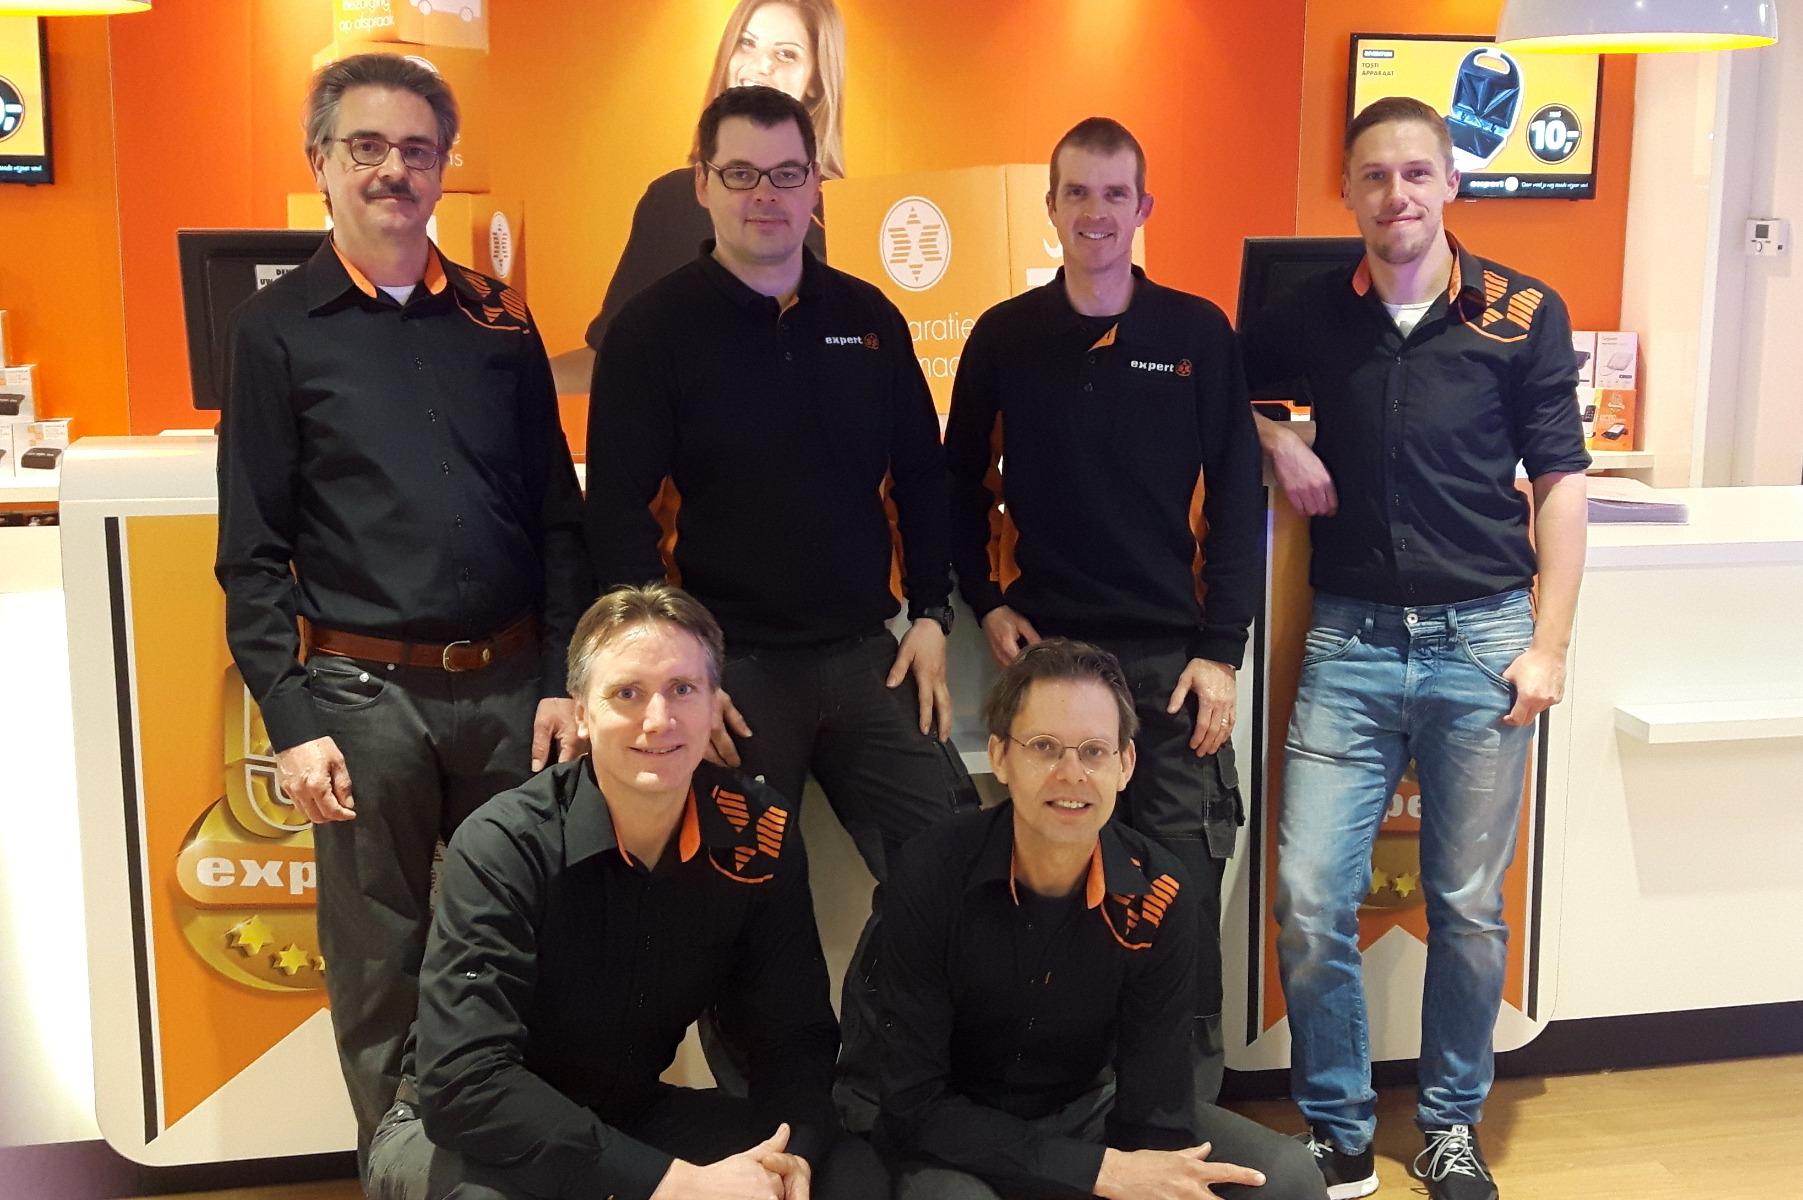 Expert Team Kaatsheuvel